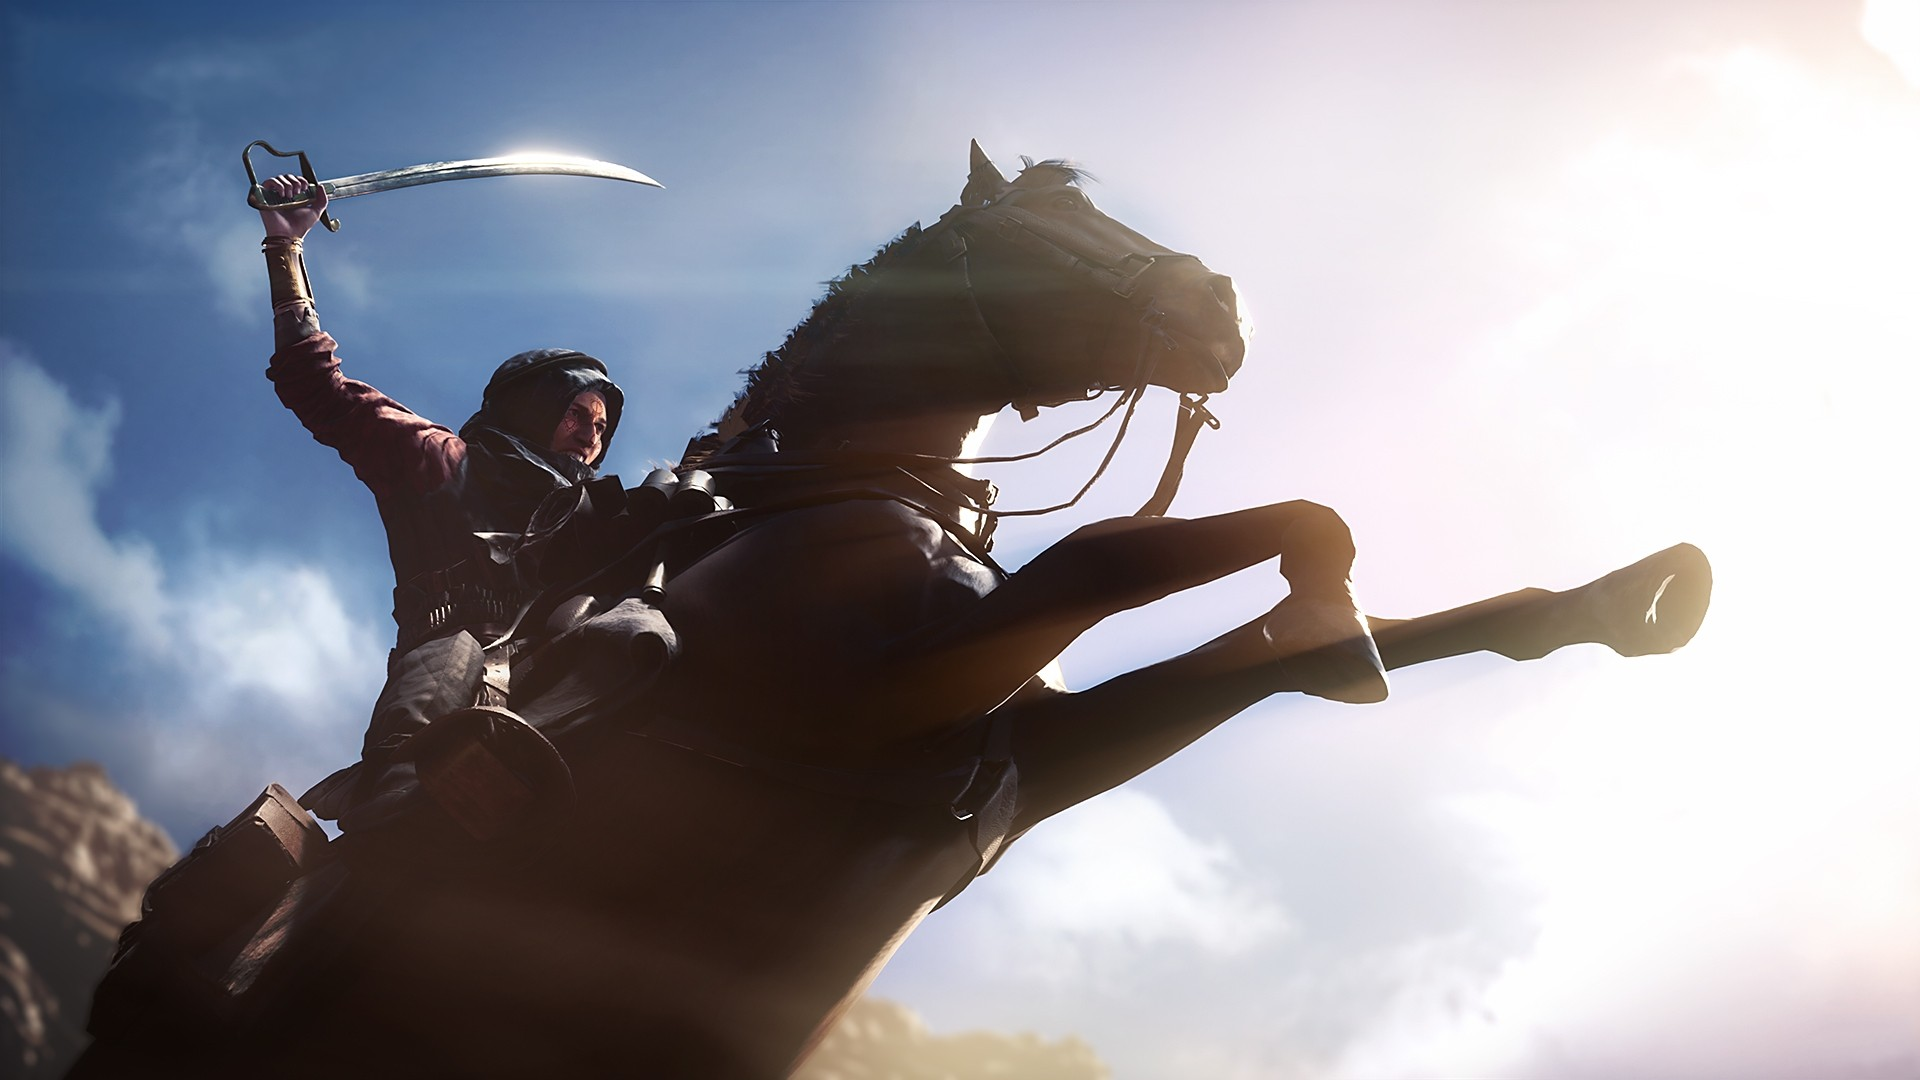 Battlefield 1 Wallpaper Photo HD